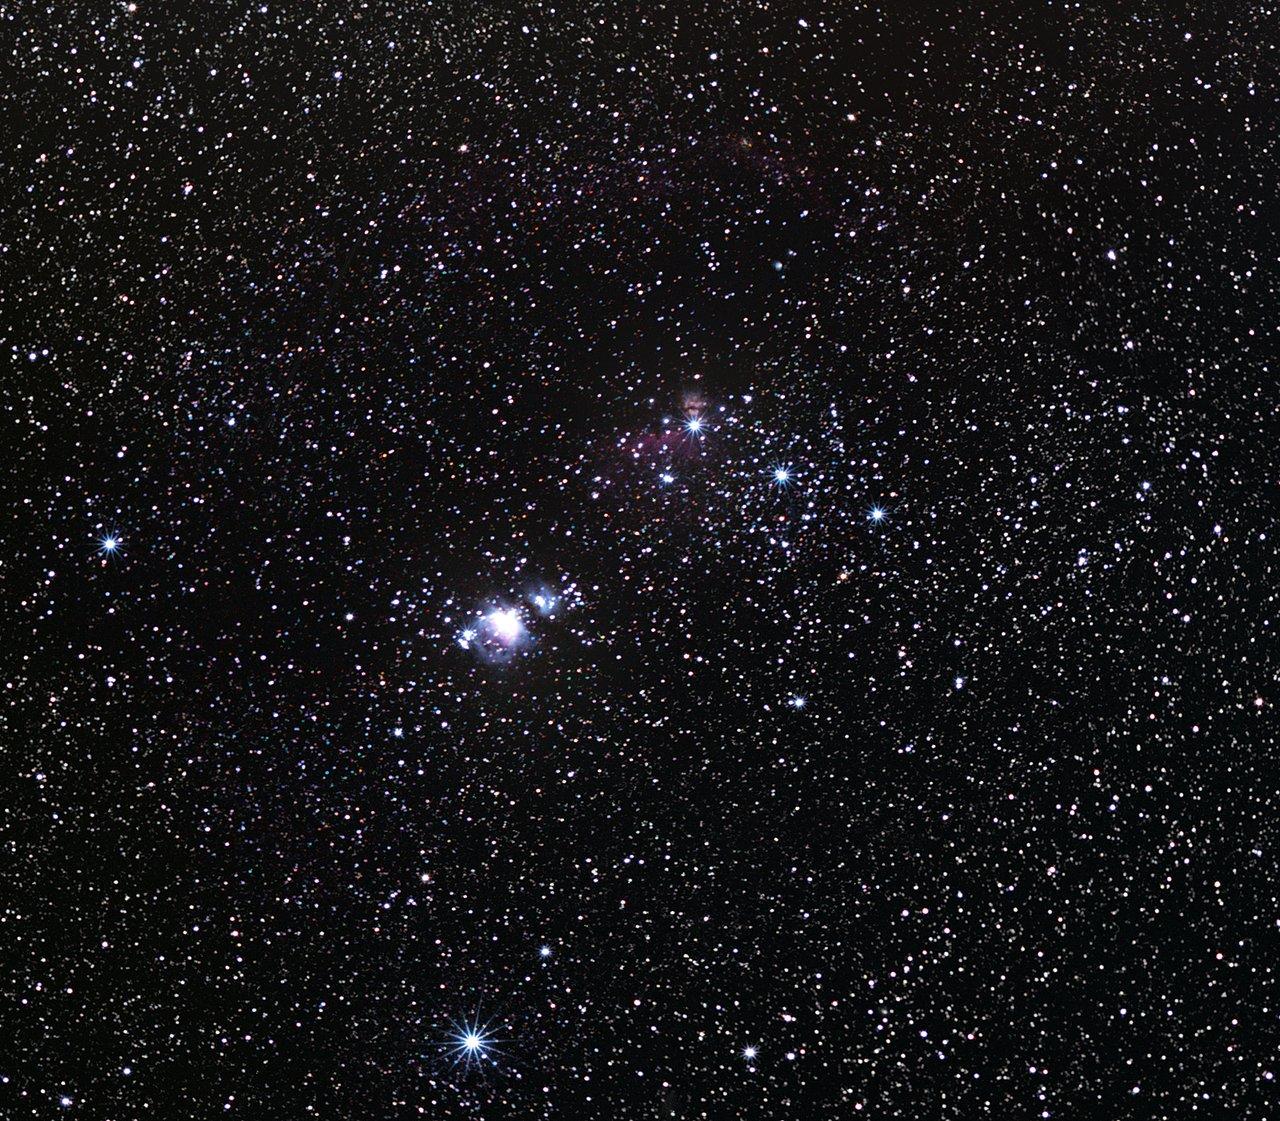 Orion Constellation Wallpaper - WallpaperSafari